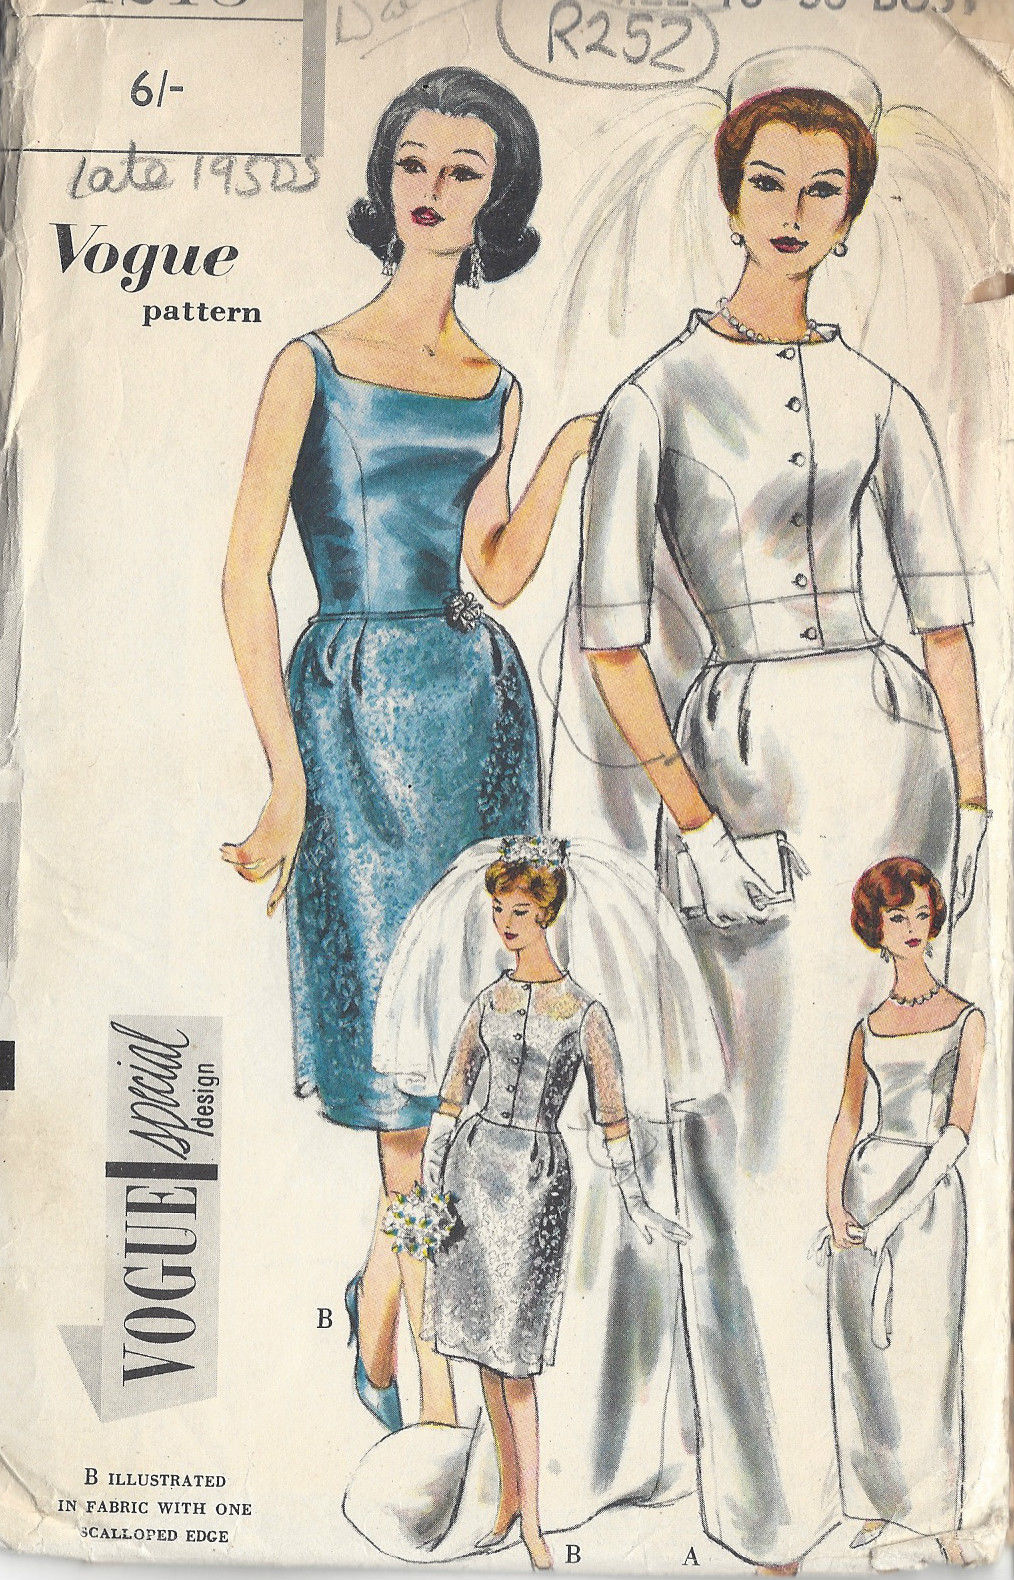 1960s Vintage Vogue Sewing Pattern B36 Quot Wedding Dress